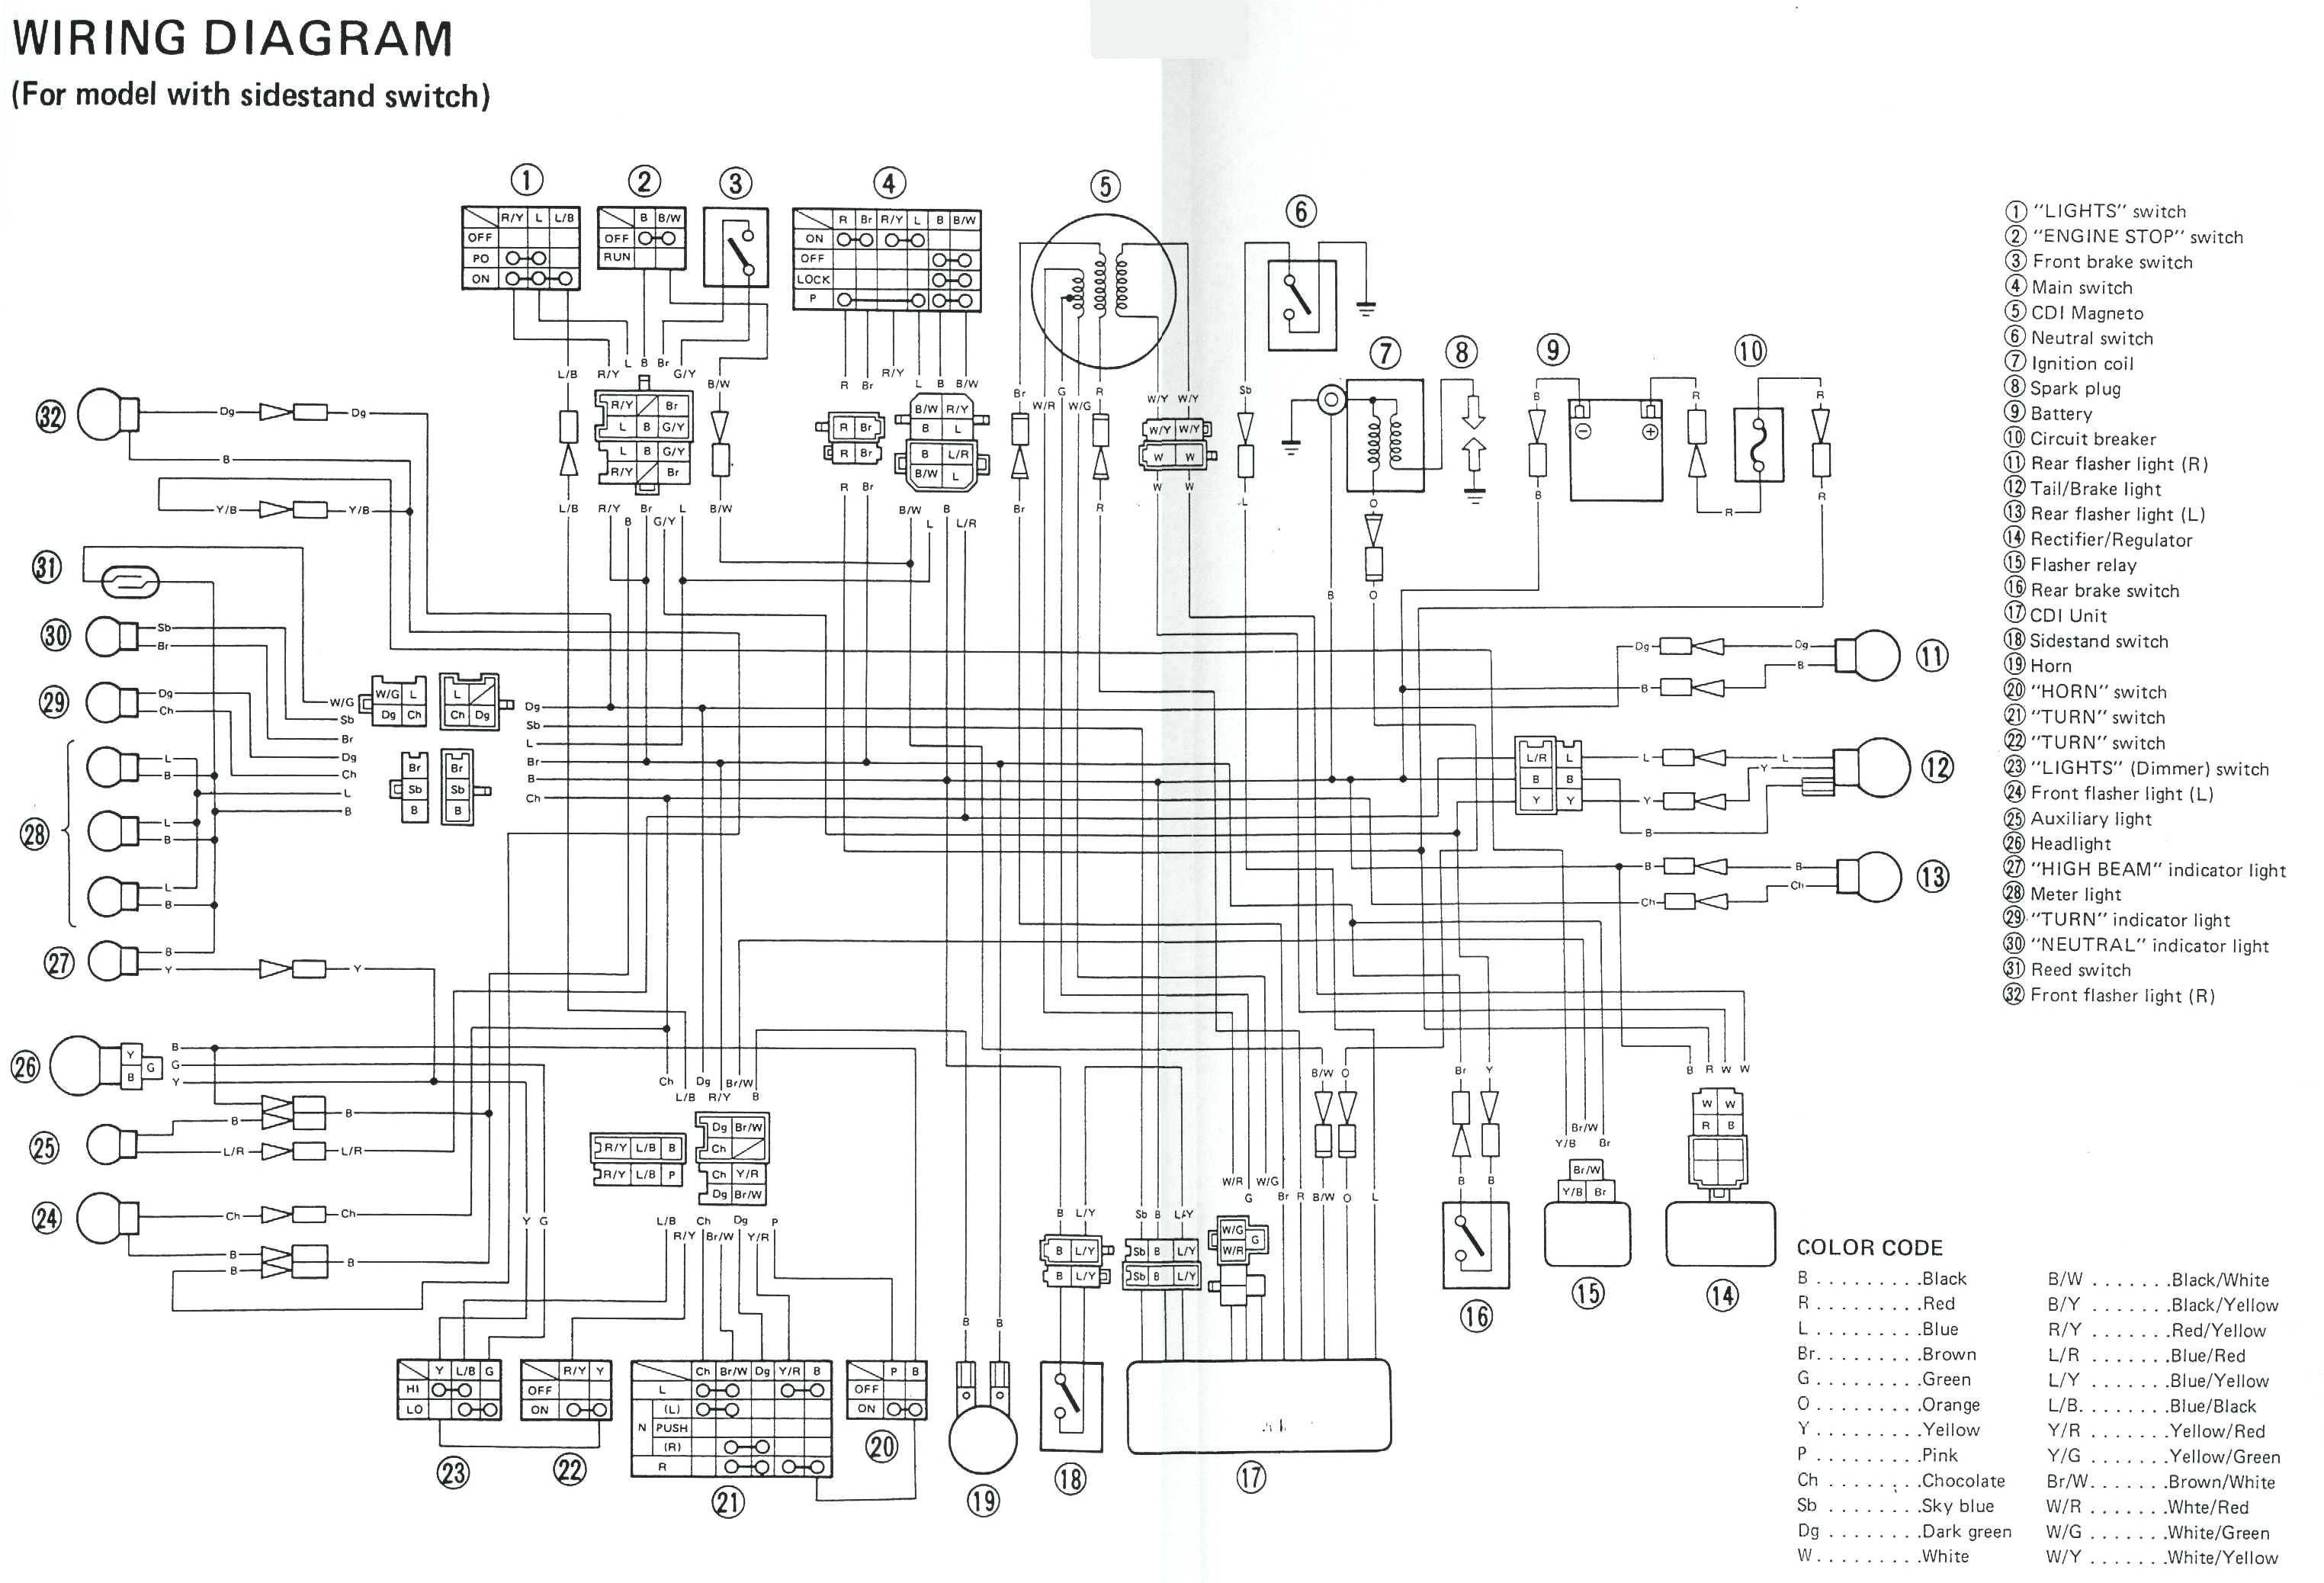 motor wiring diagram on yamaha 703 remote control wiring diagram